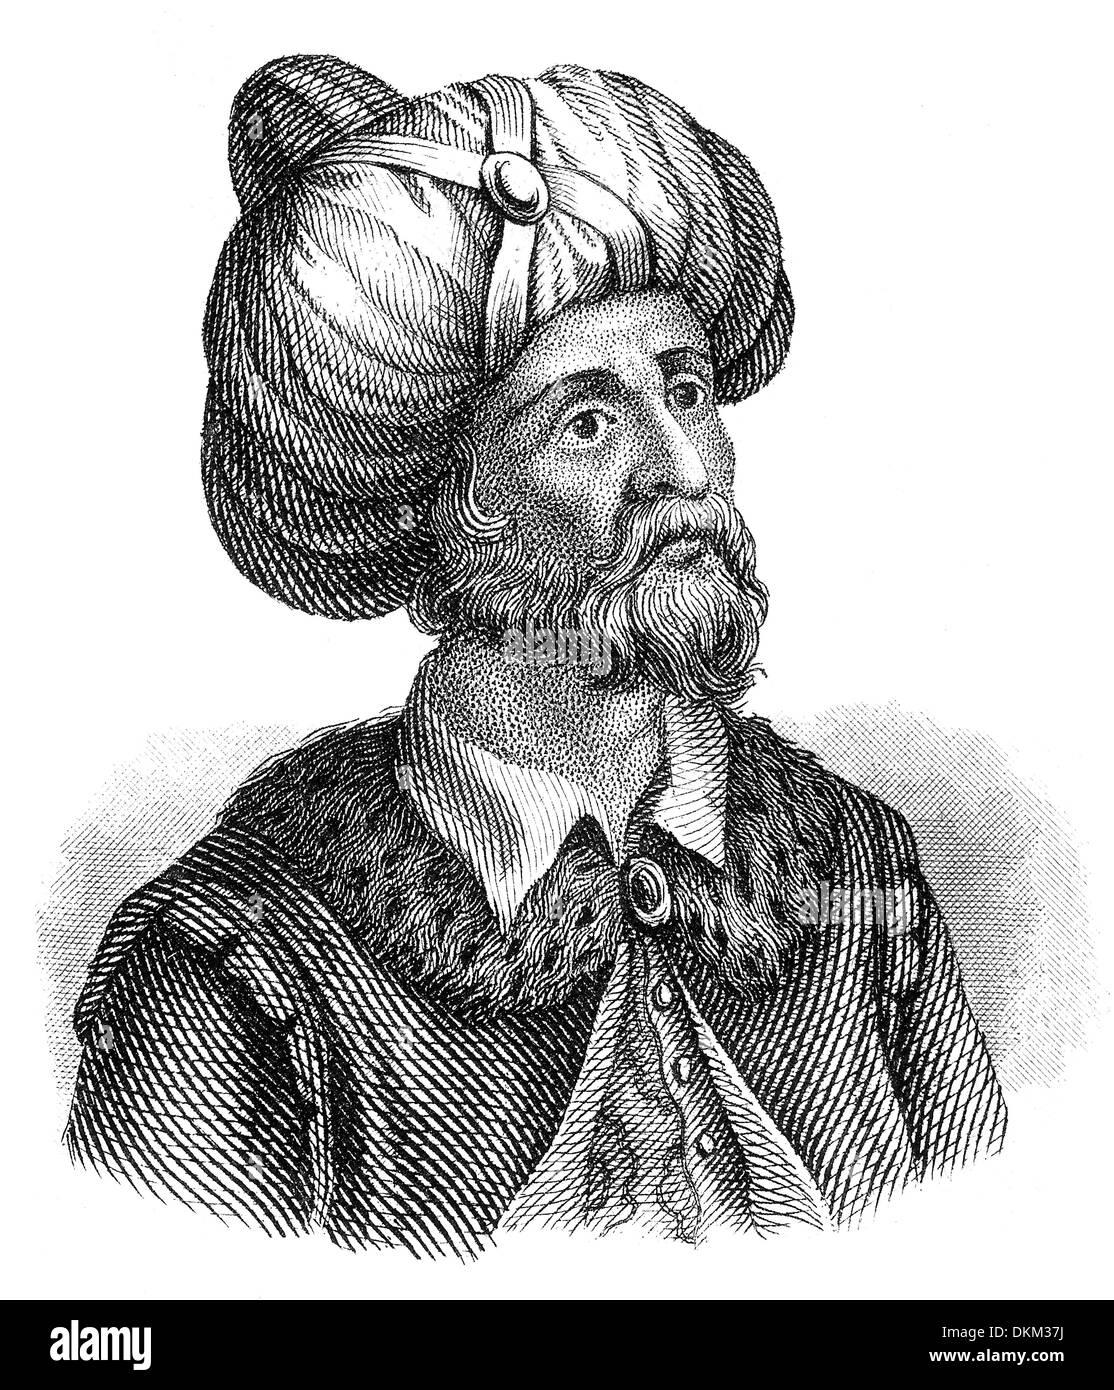 Portrait of Muhammad or Abū al-Qāsim Muḥammad ibn ʿAbd Allāh ibn ʿAbd al-Muṭṭalib ibn Hāshim, c. 570 - 632, the founder of Islam - Stock Image